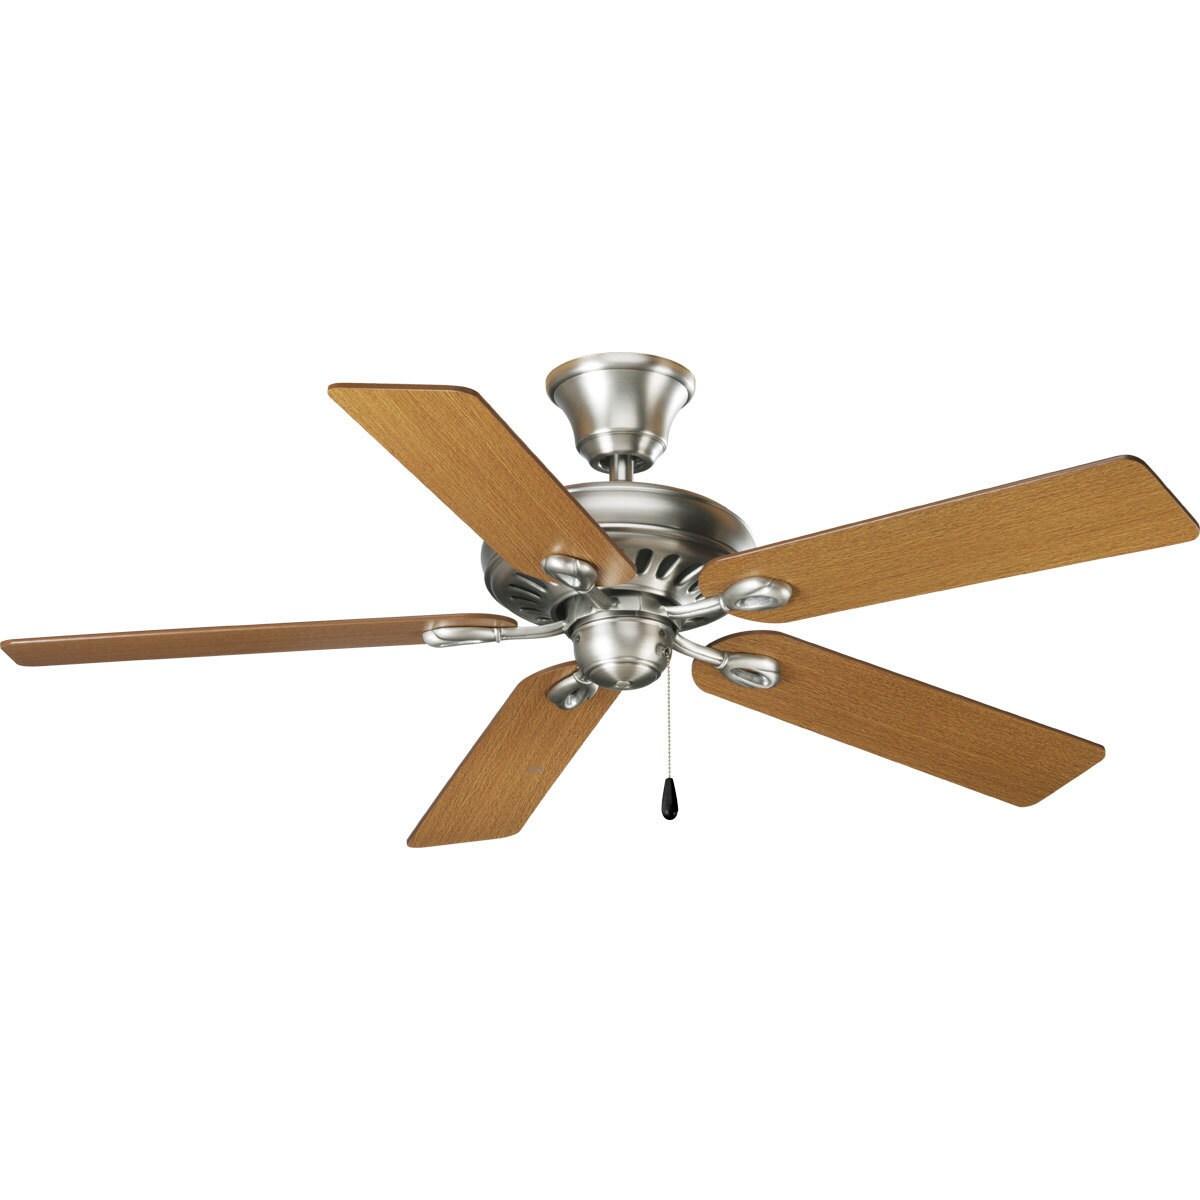 progress lighting airpro signature 52 inch 5 blade antique nickel ceiling fan